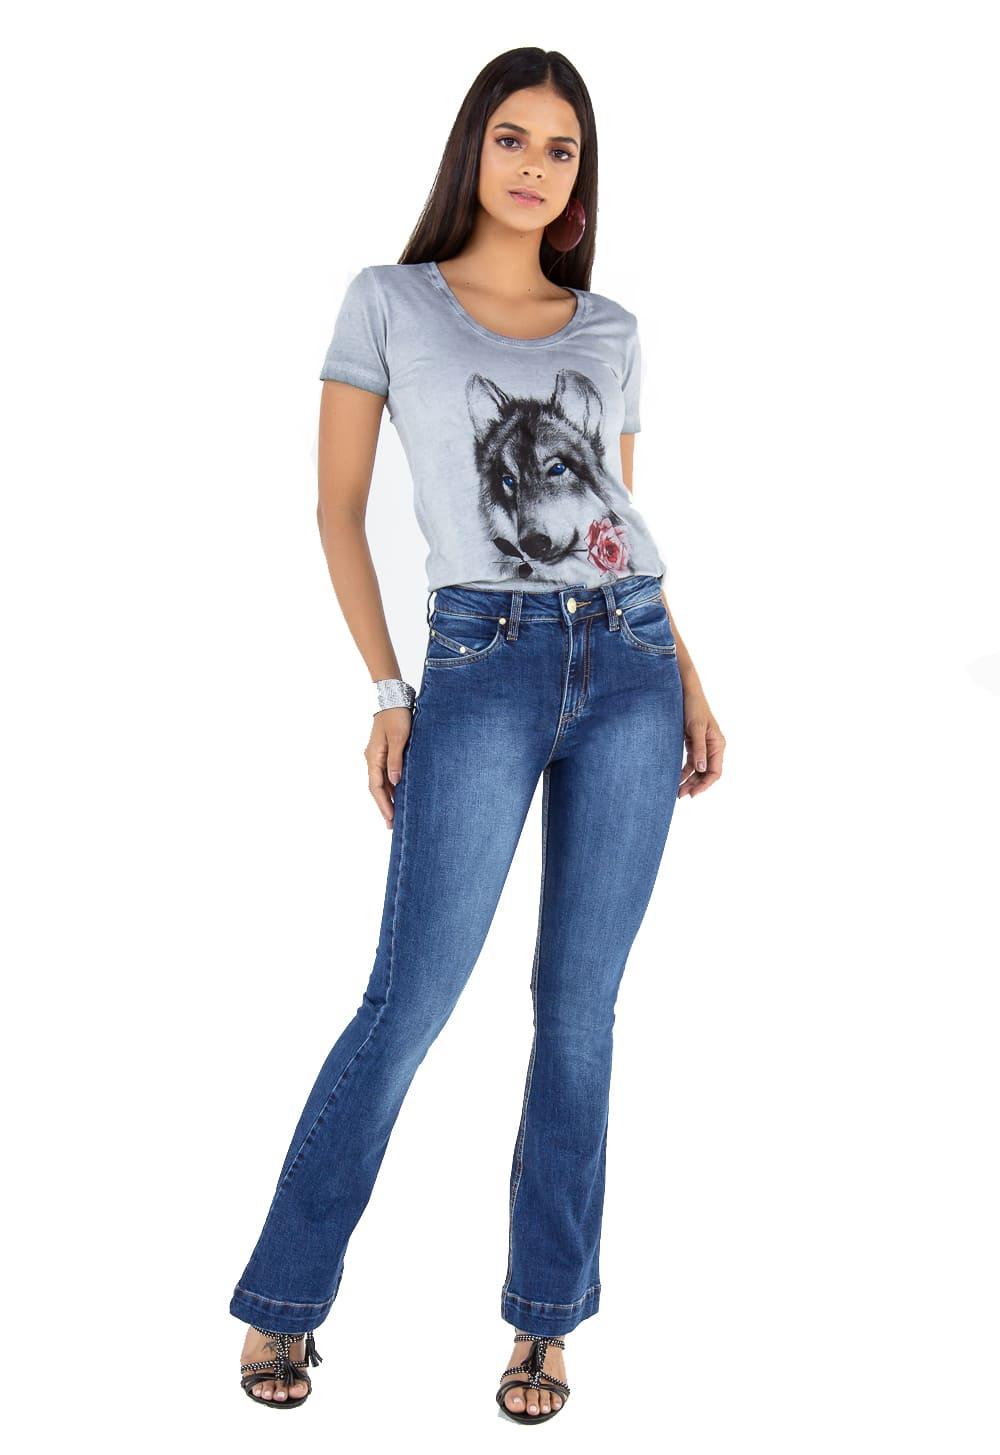 Calça Feminina Flare Jeans Tradicional Alta